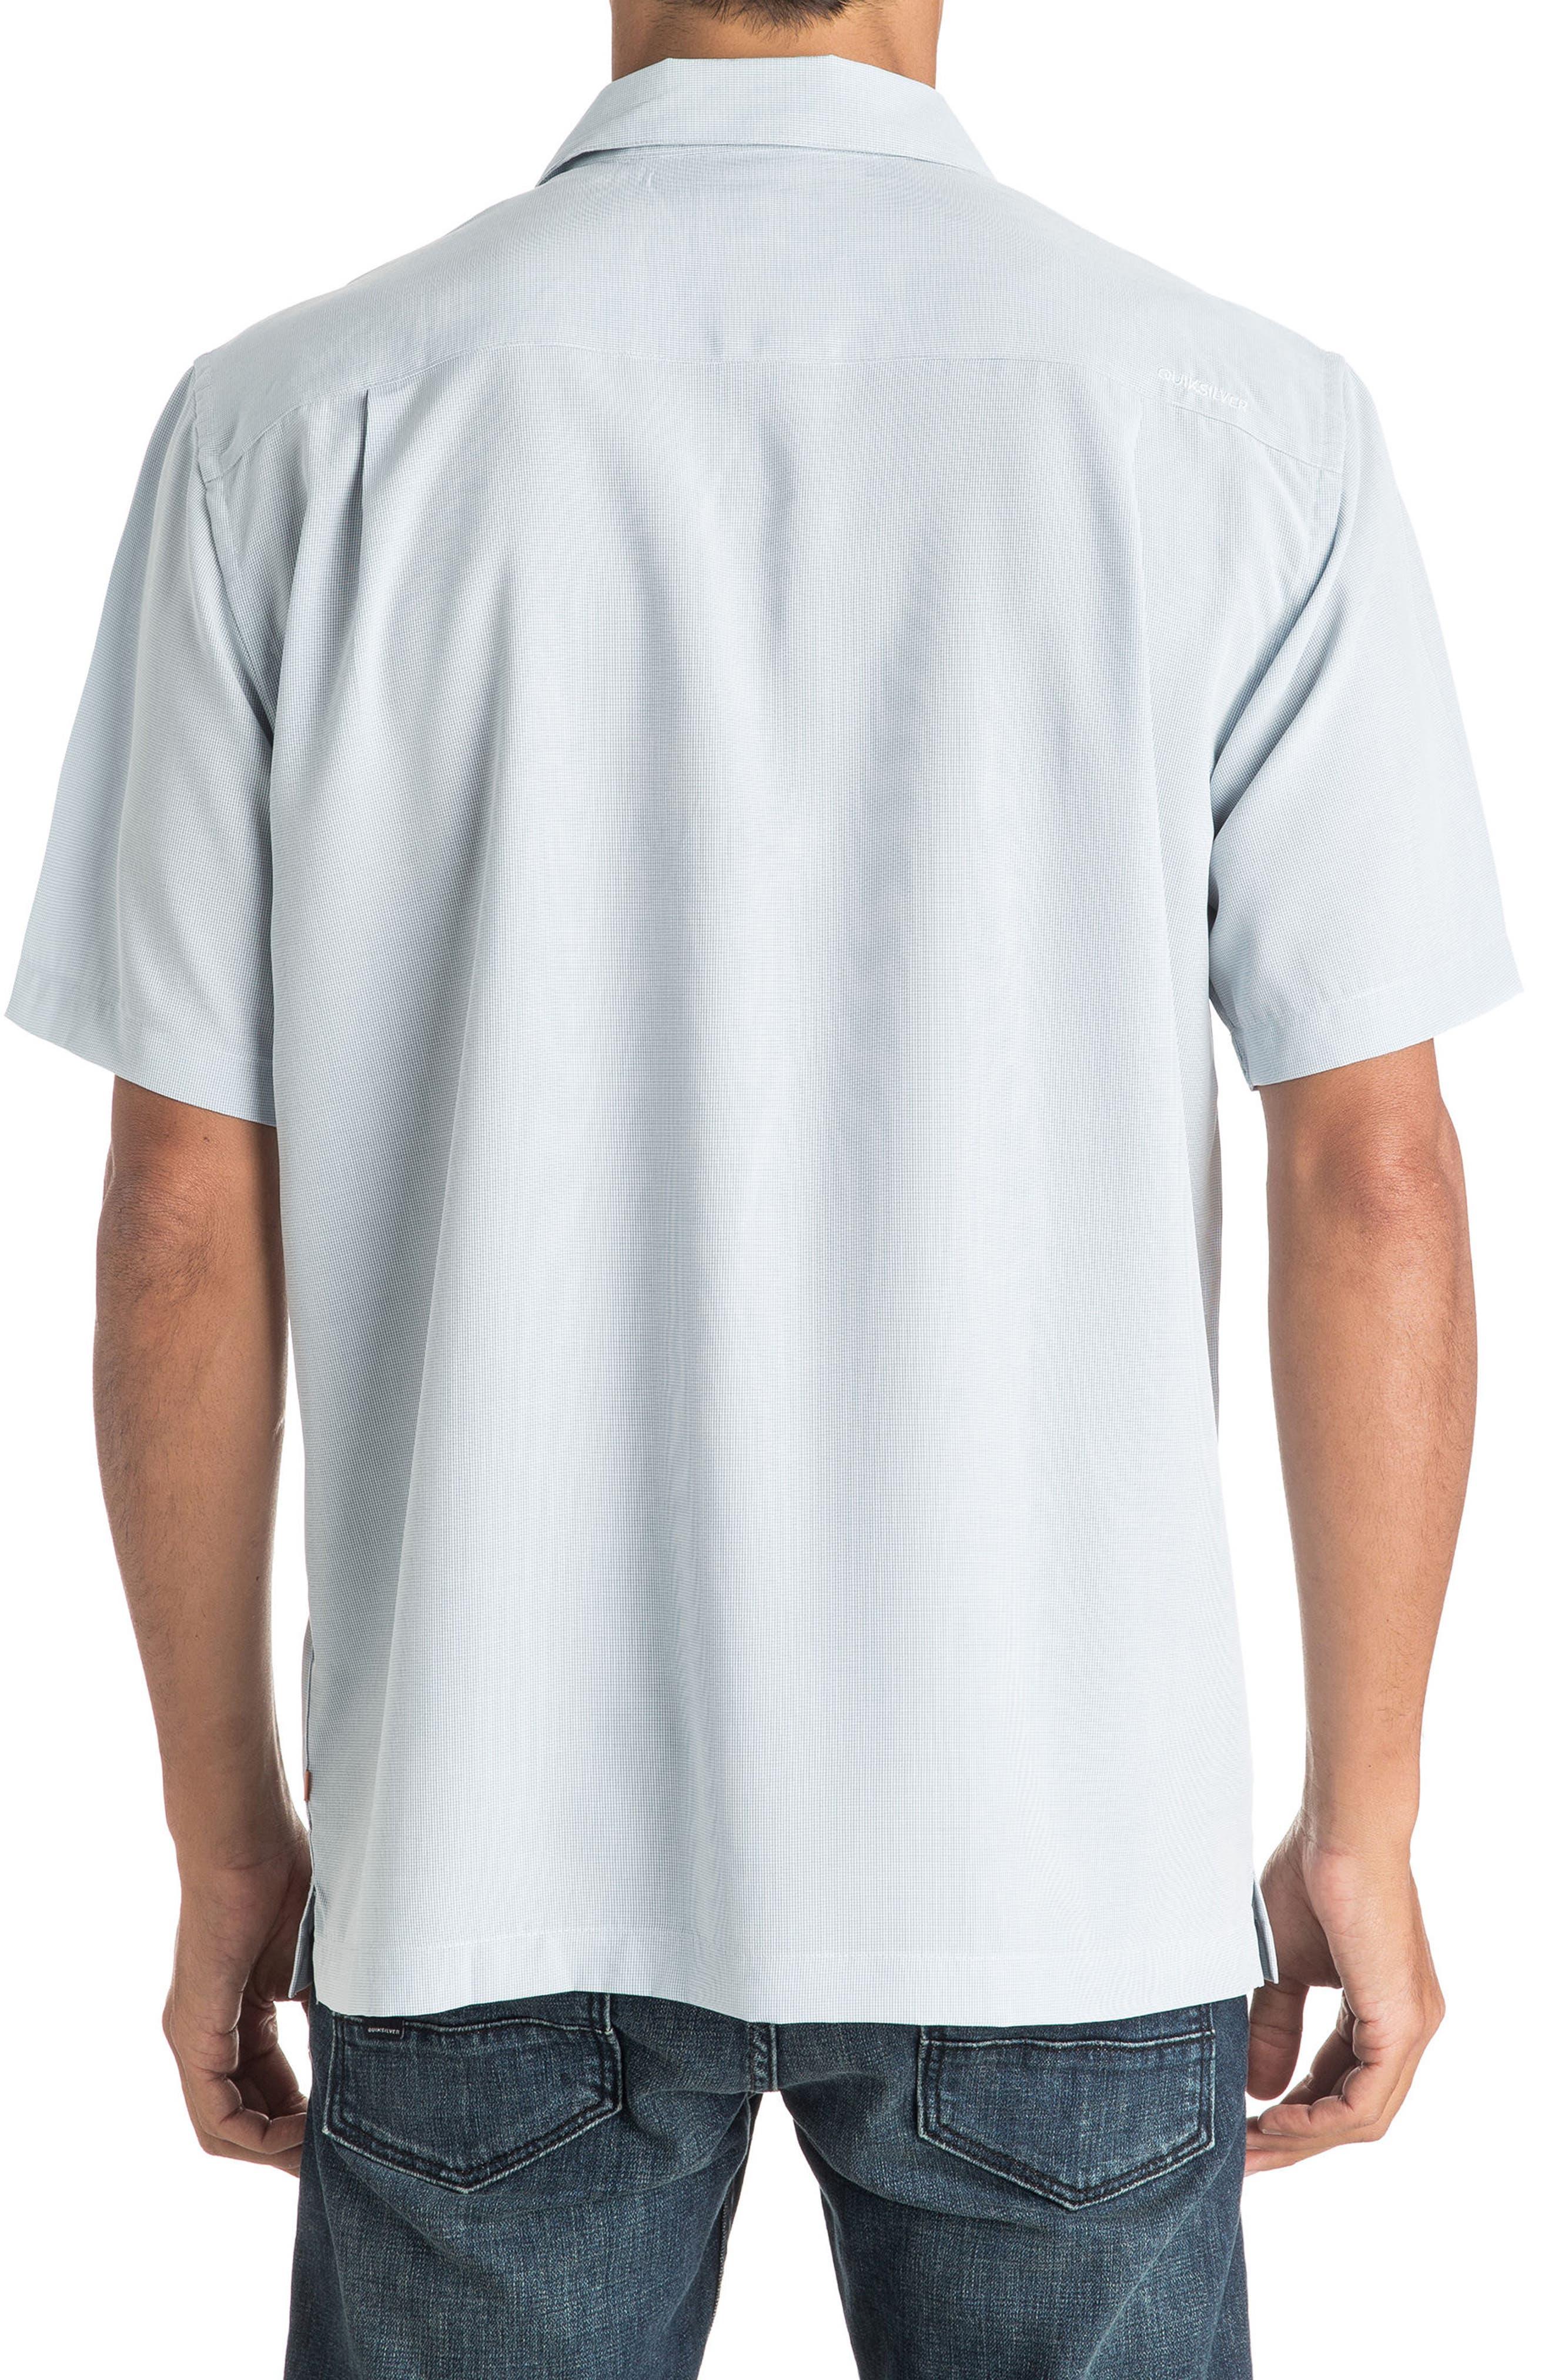 Alternate Image 2  - Quiksilver Waterman Collection 'Cane Island' Regular Fit Short Sleeve Sport Shirt